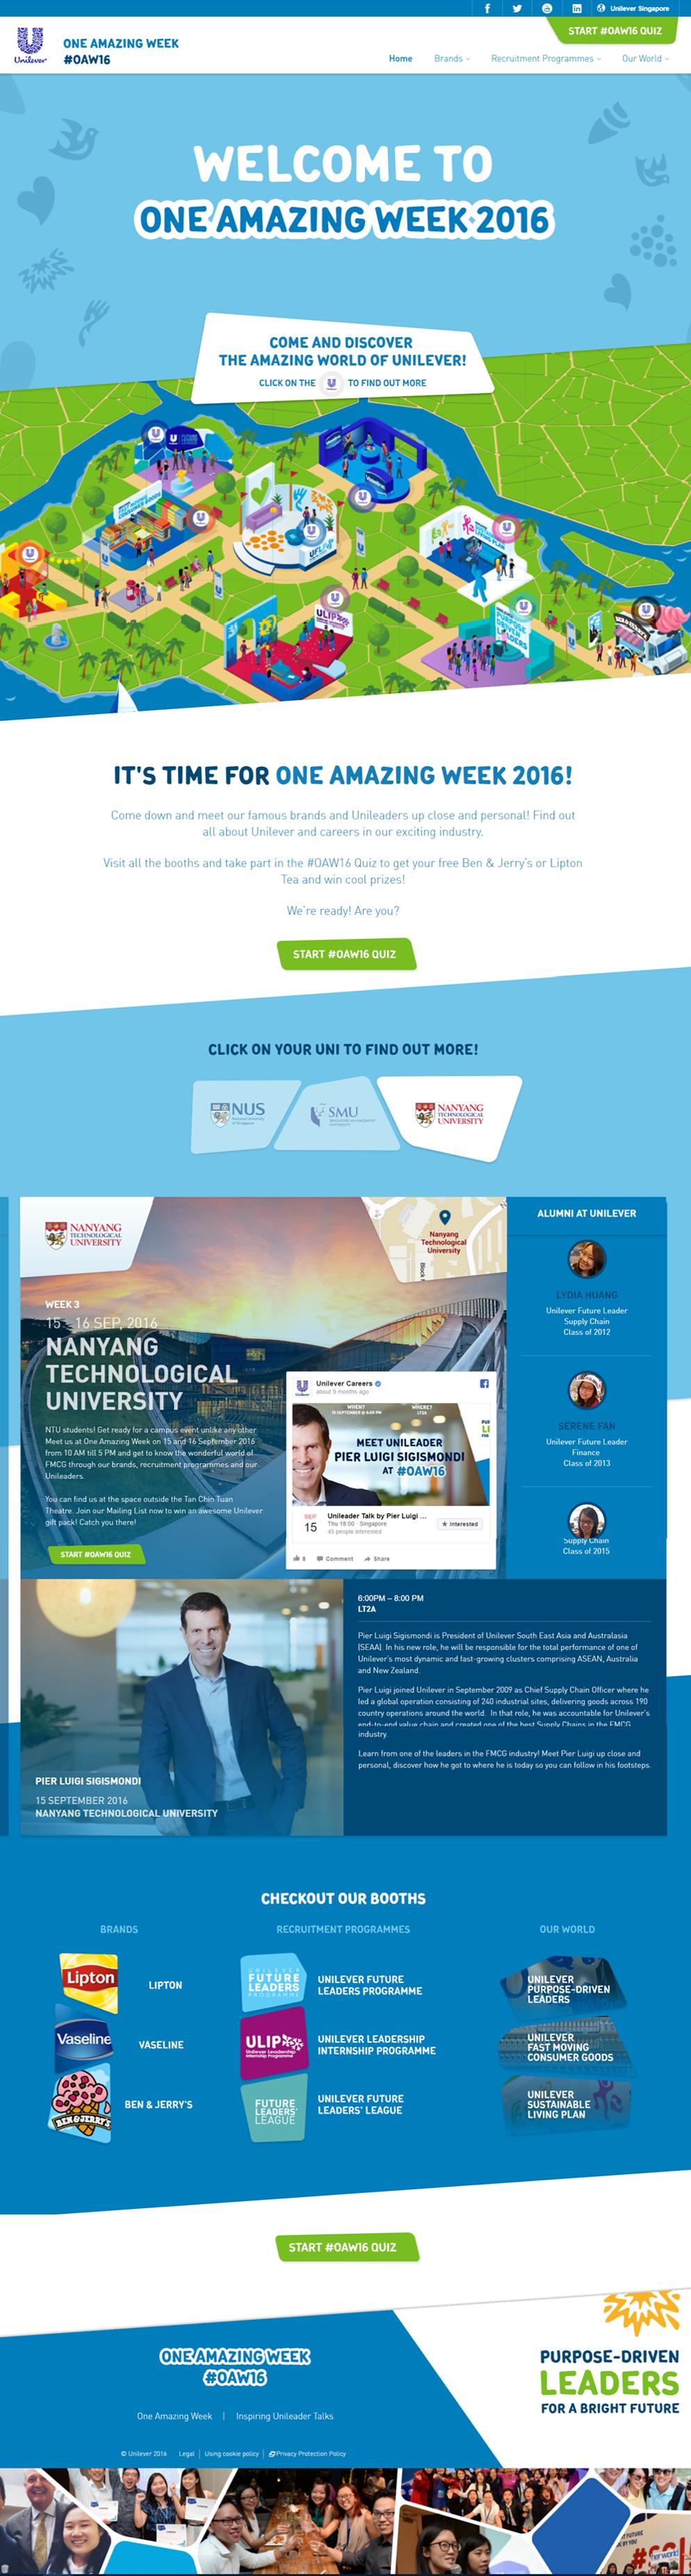 The EMMS Website Development Project: One Amazing Week - FMCG Company